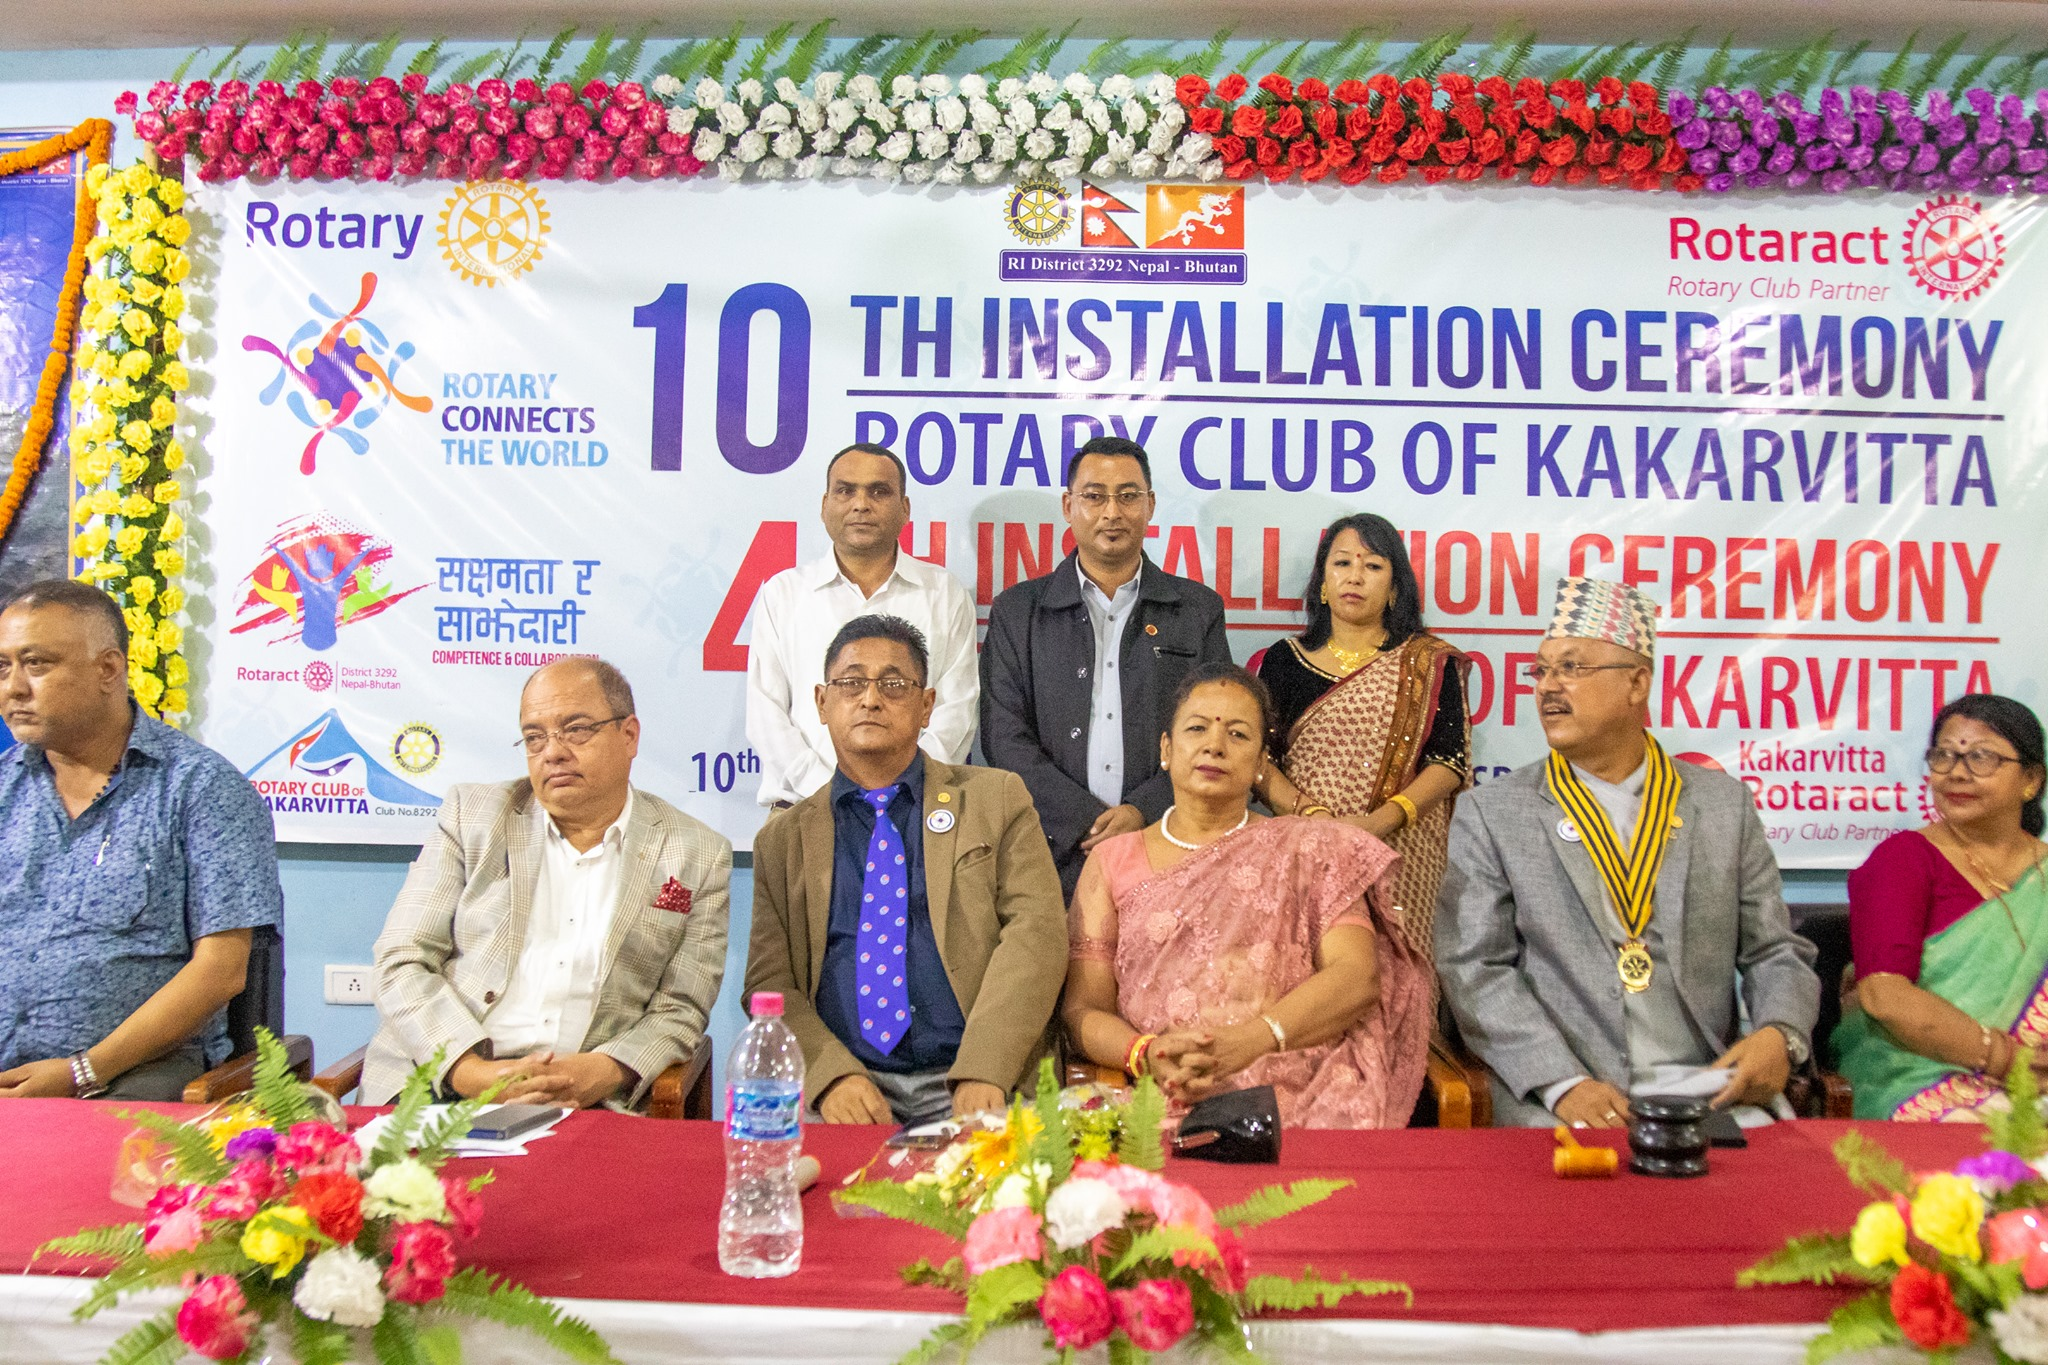 10th Installation Ceremony Rotary Club Of Kakarvitta 37